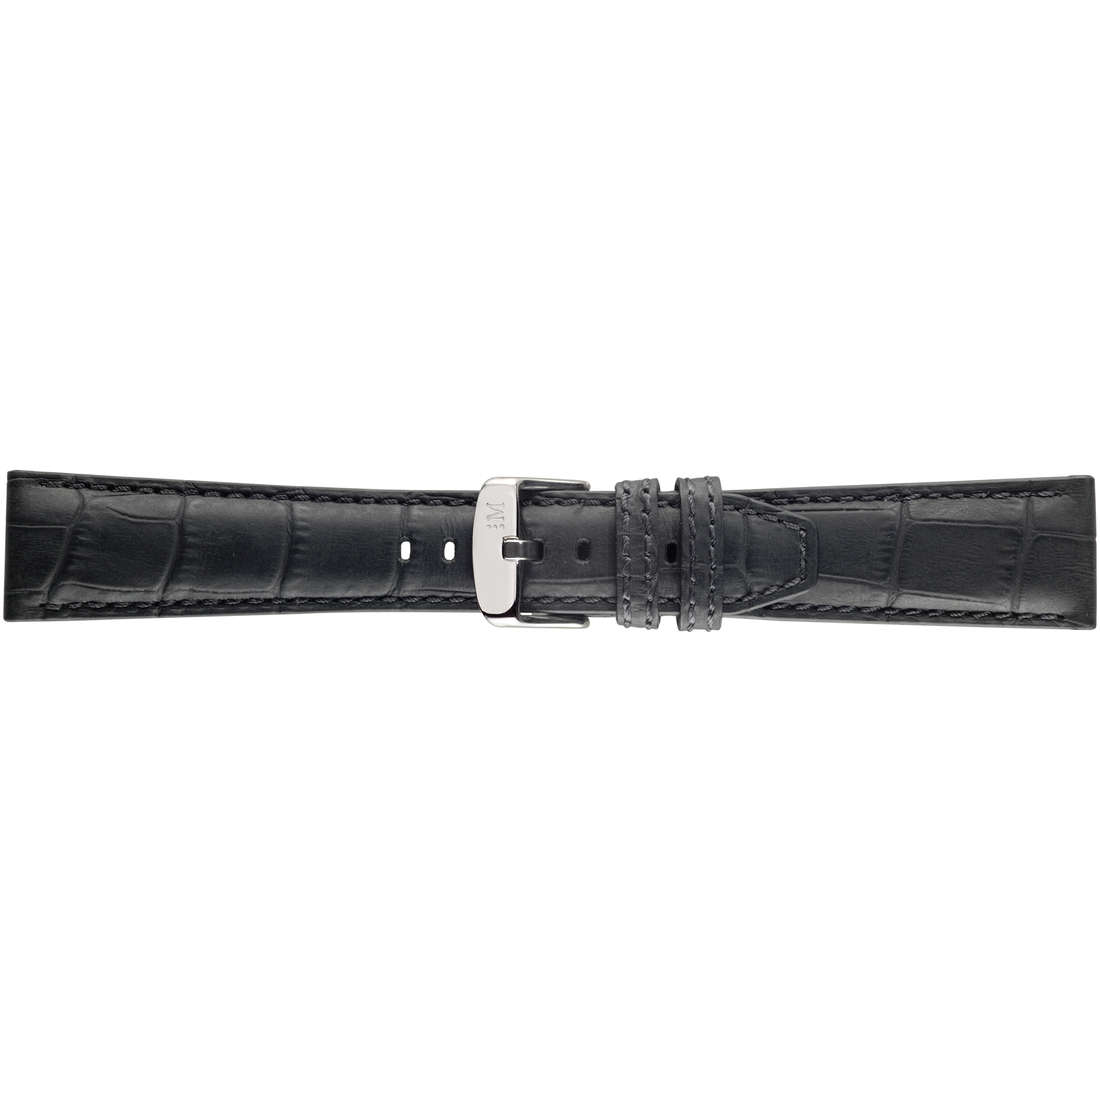 watch watch bands watch straps man Morellato Linea Sport A01X4497B44019CR18